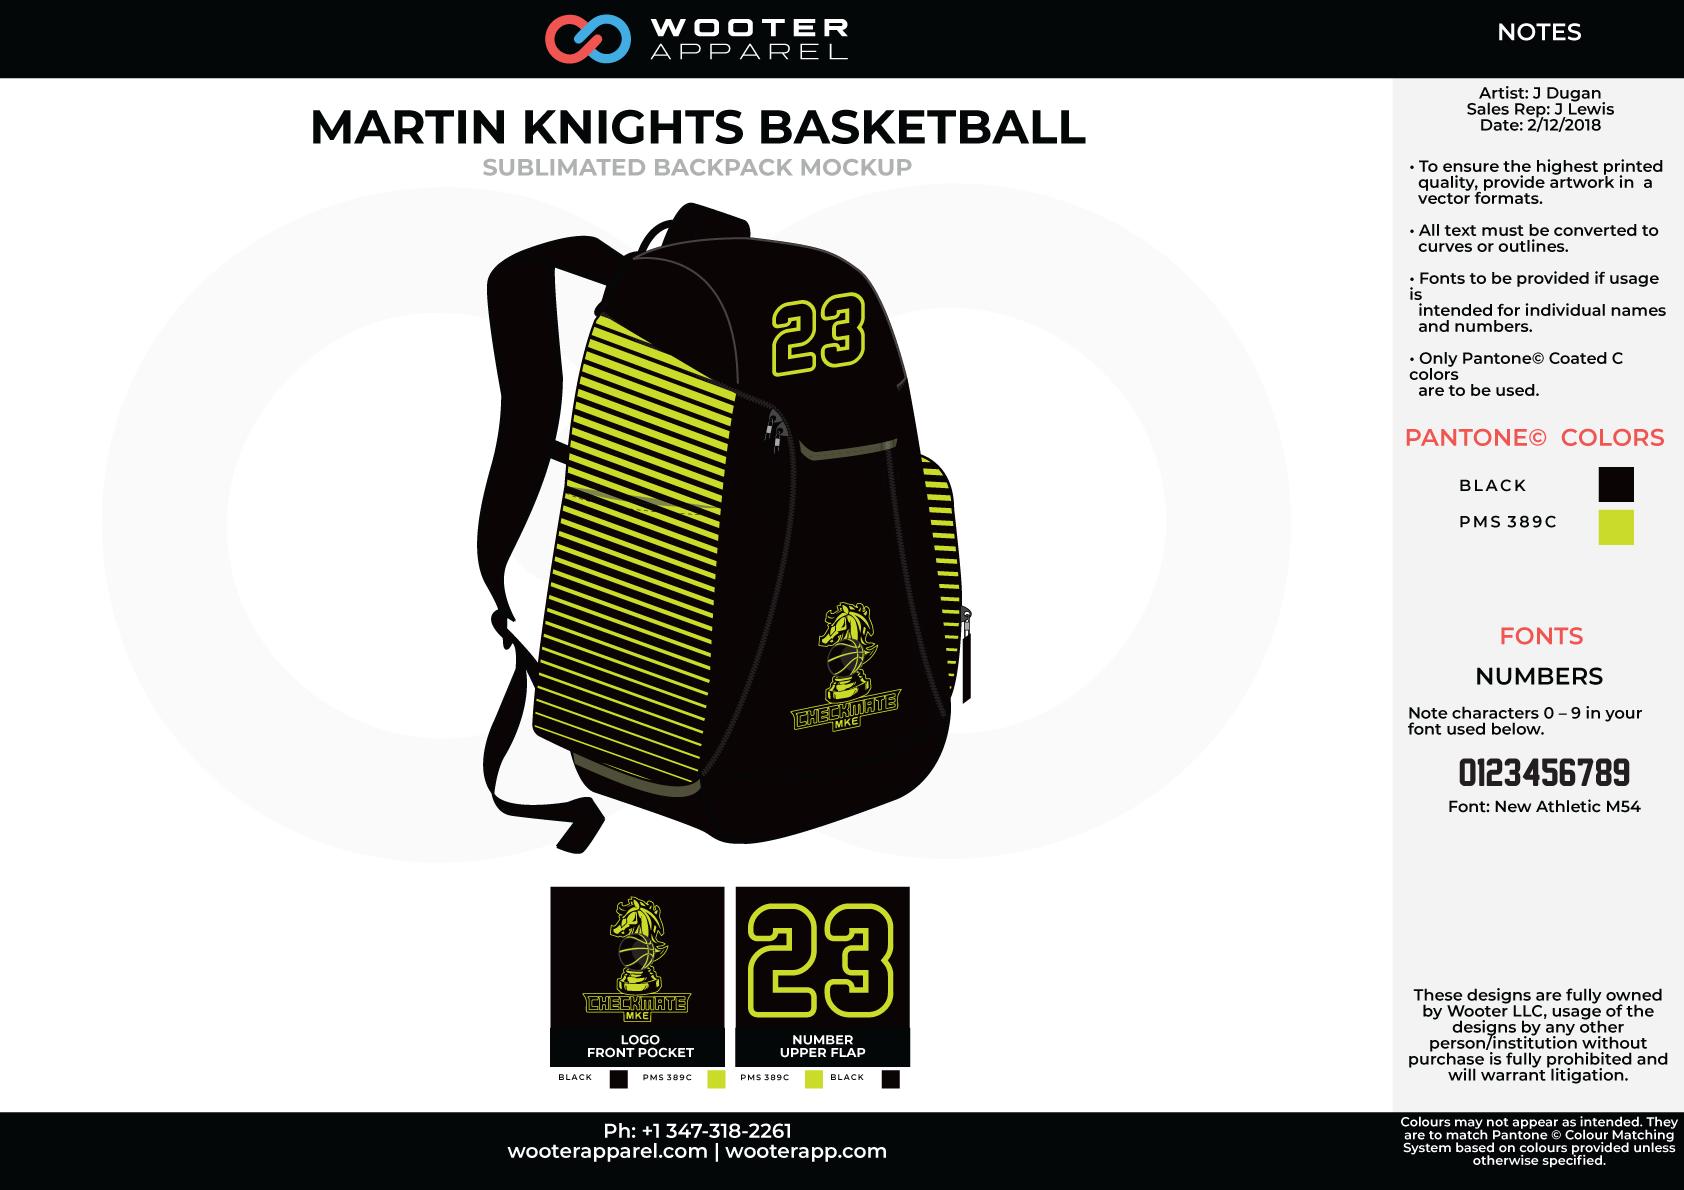 MARTIN KNIGHTS Black Yellow/Green Sublimated Basketball Backpack Mock Up